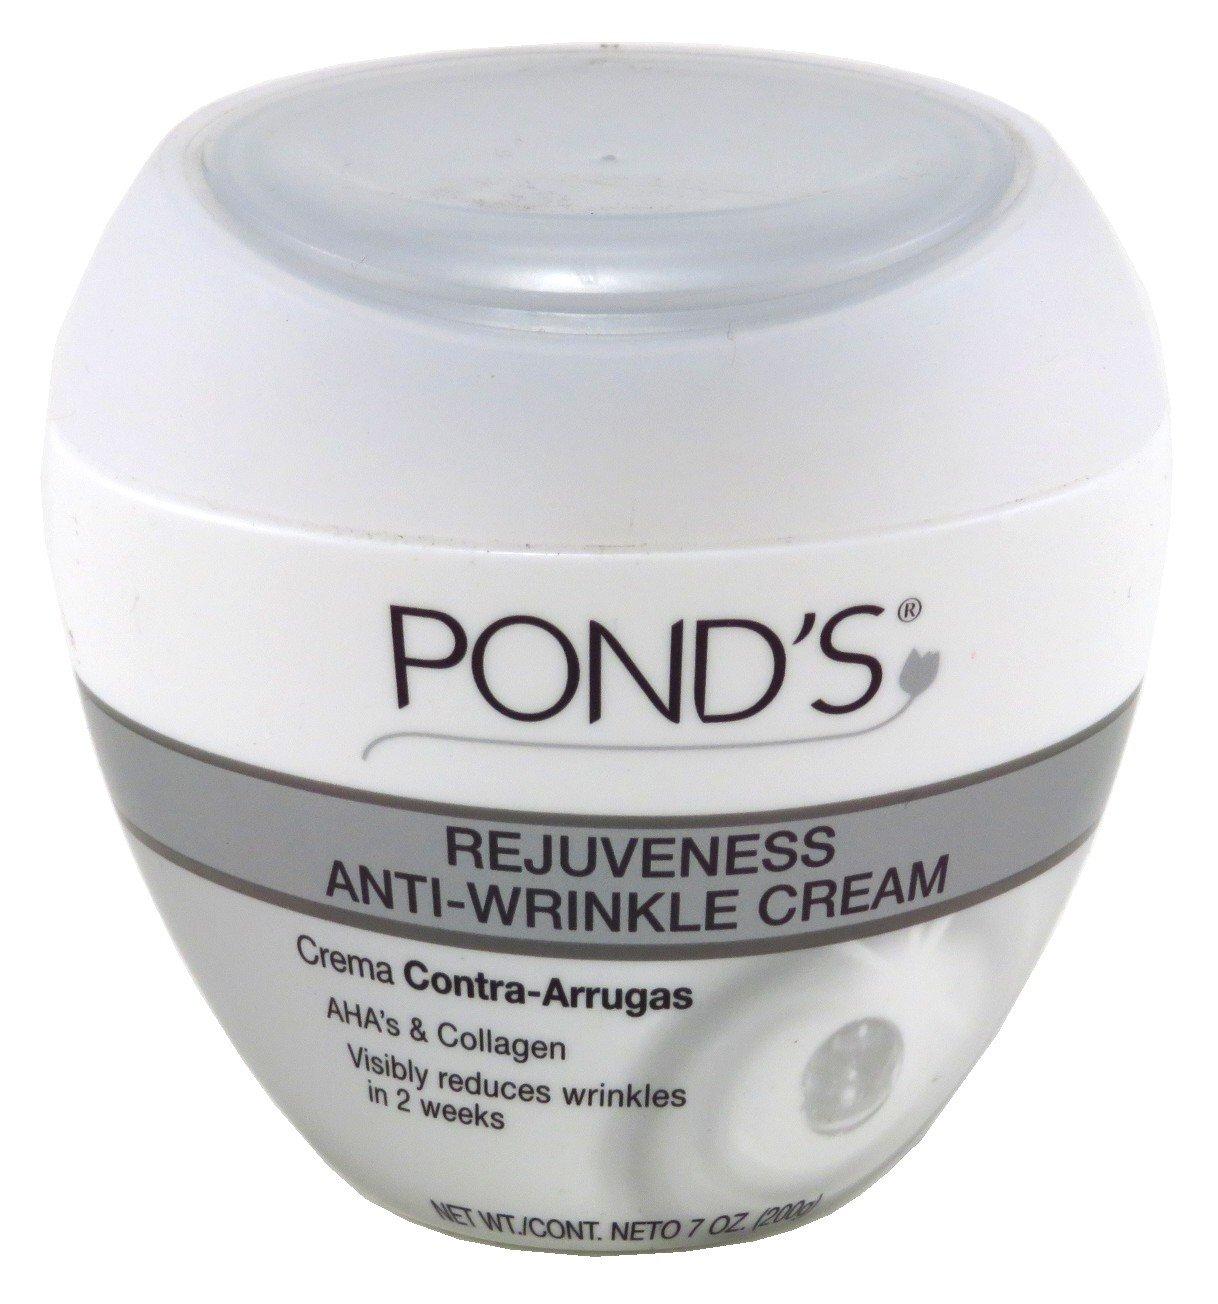 Ponds Rejuveness Anti-Wrinkle Cream 7 Ounce (207ml) (3 Pack) Pond' s